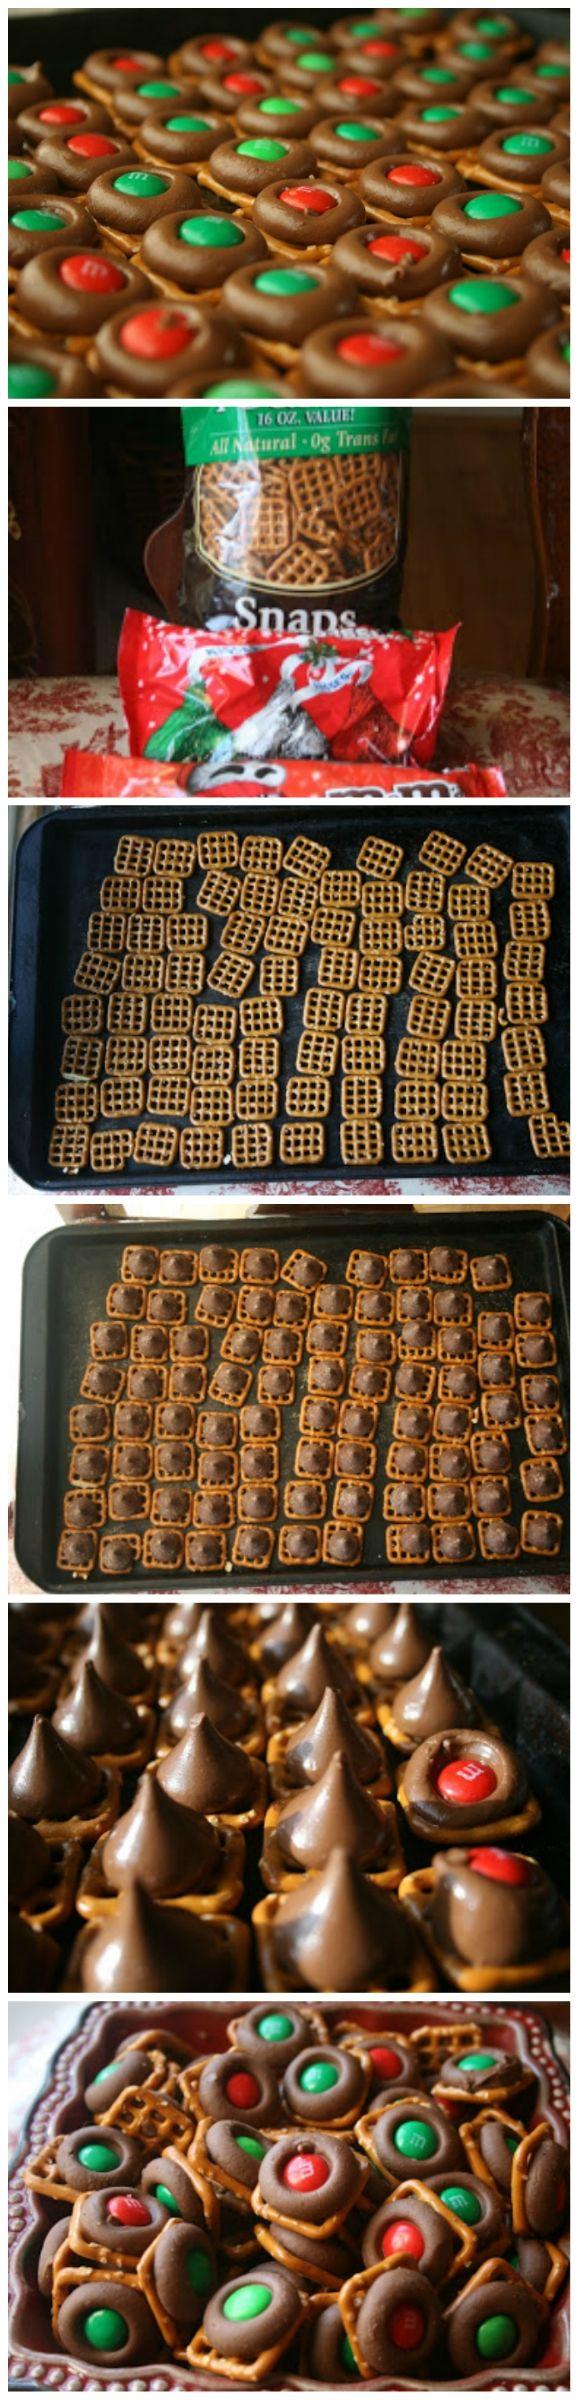 Easy Holiday Baking: Chocolate Pretzel Bites